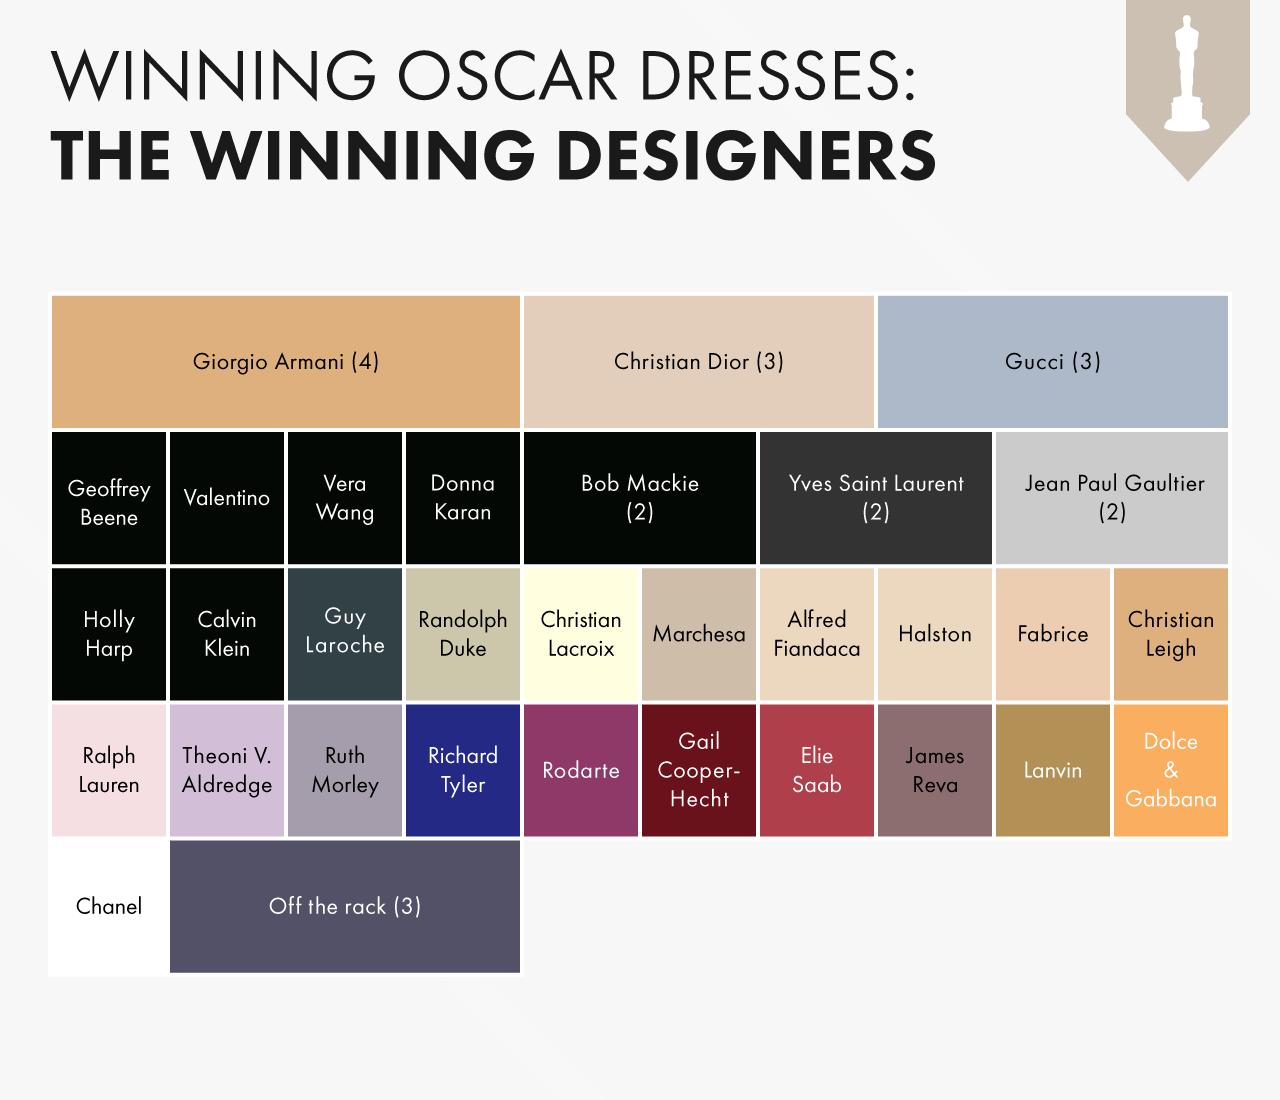 Oscars-Dresses-Designers